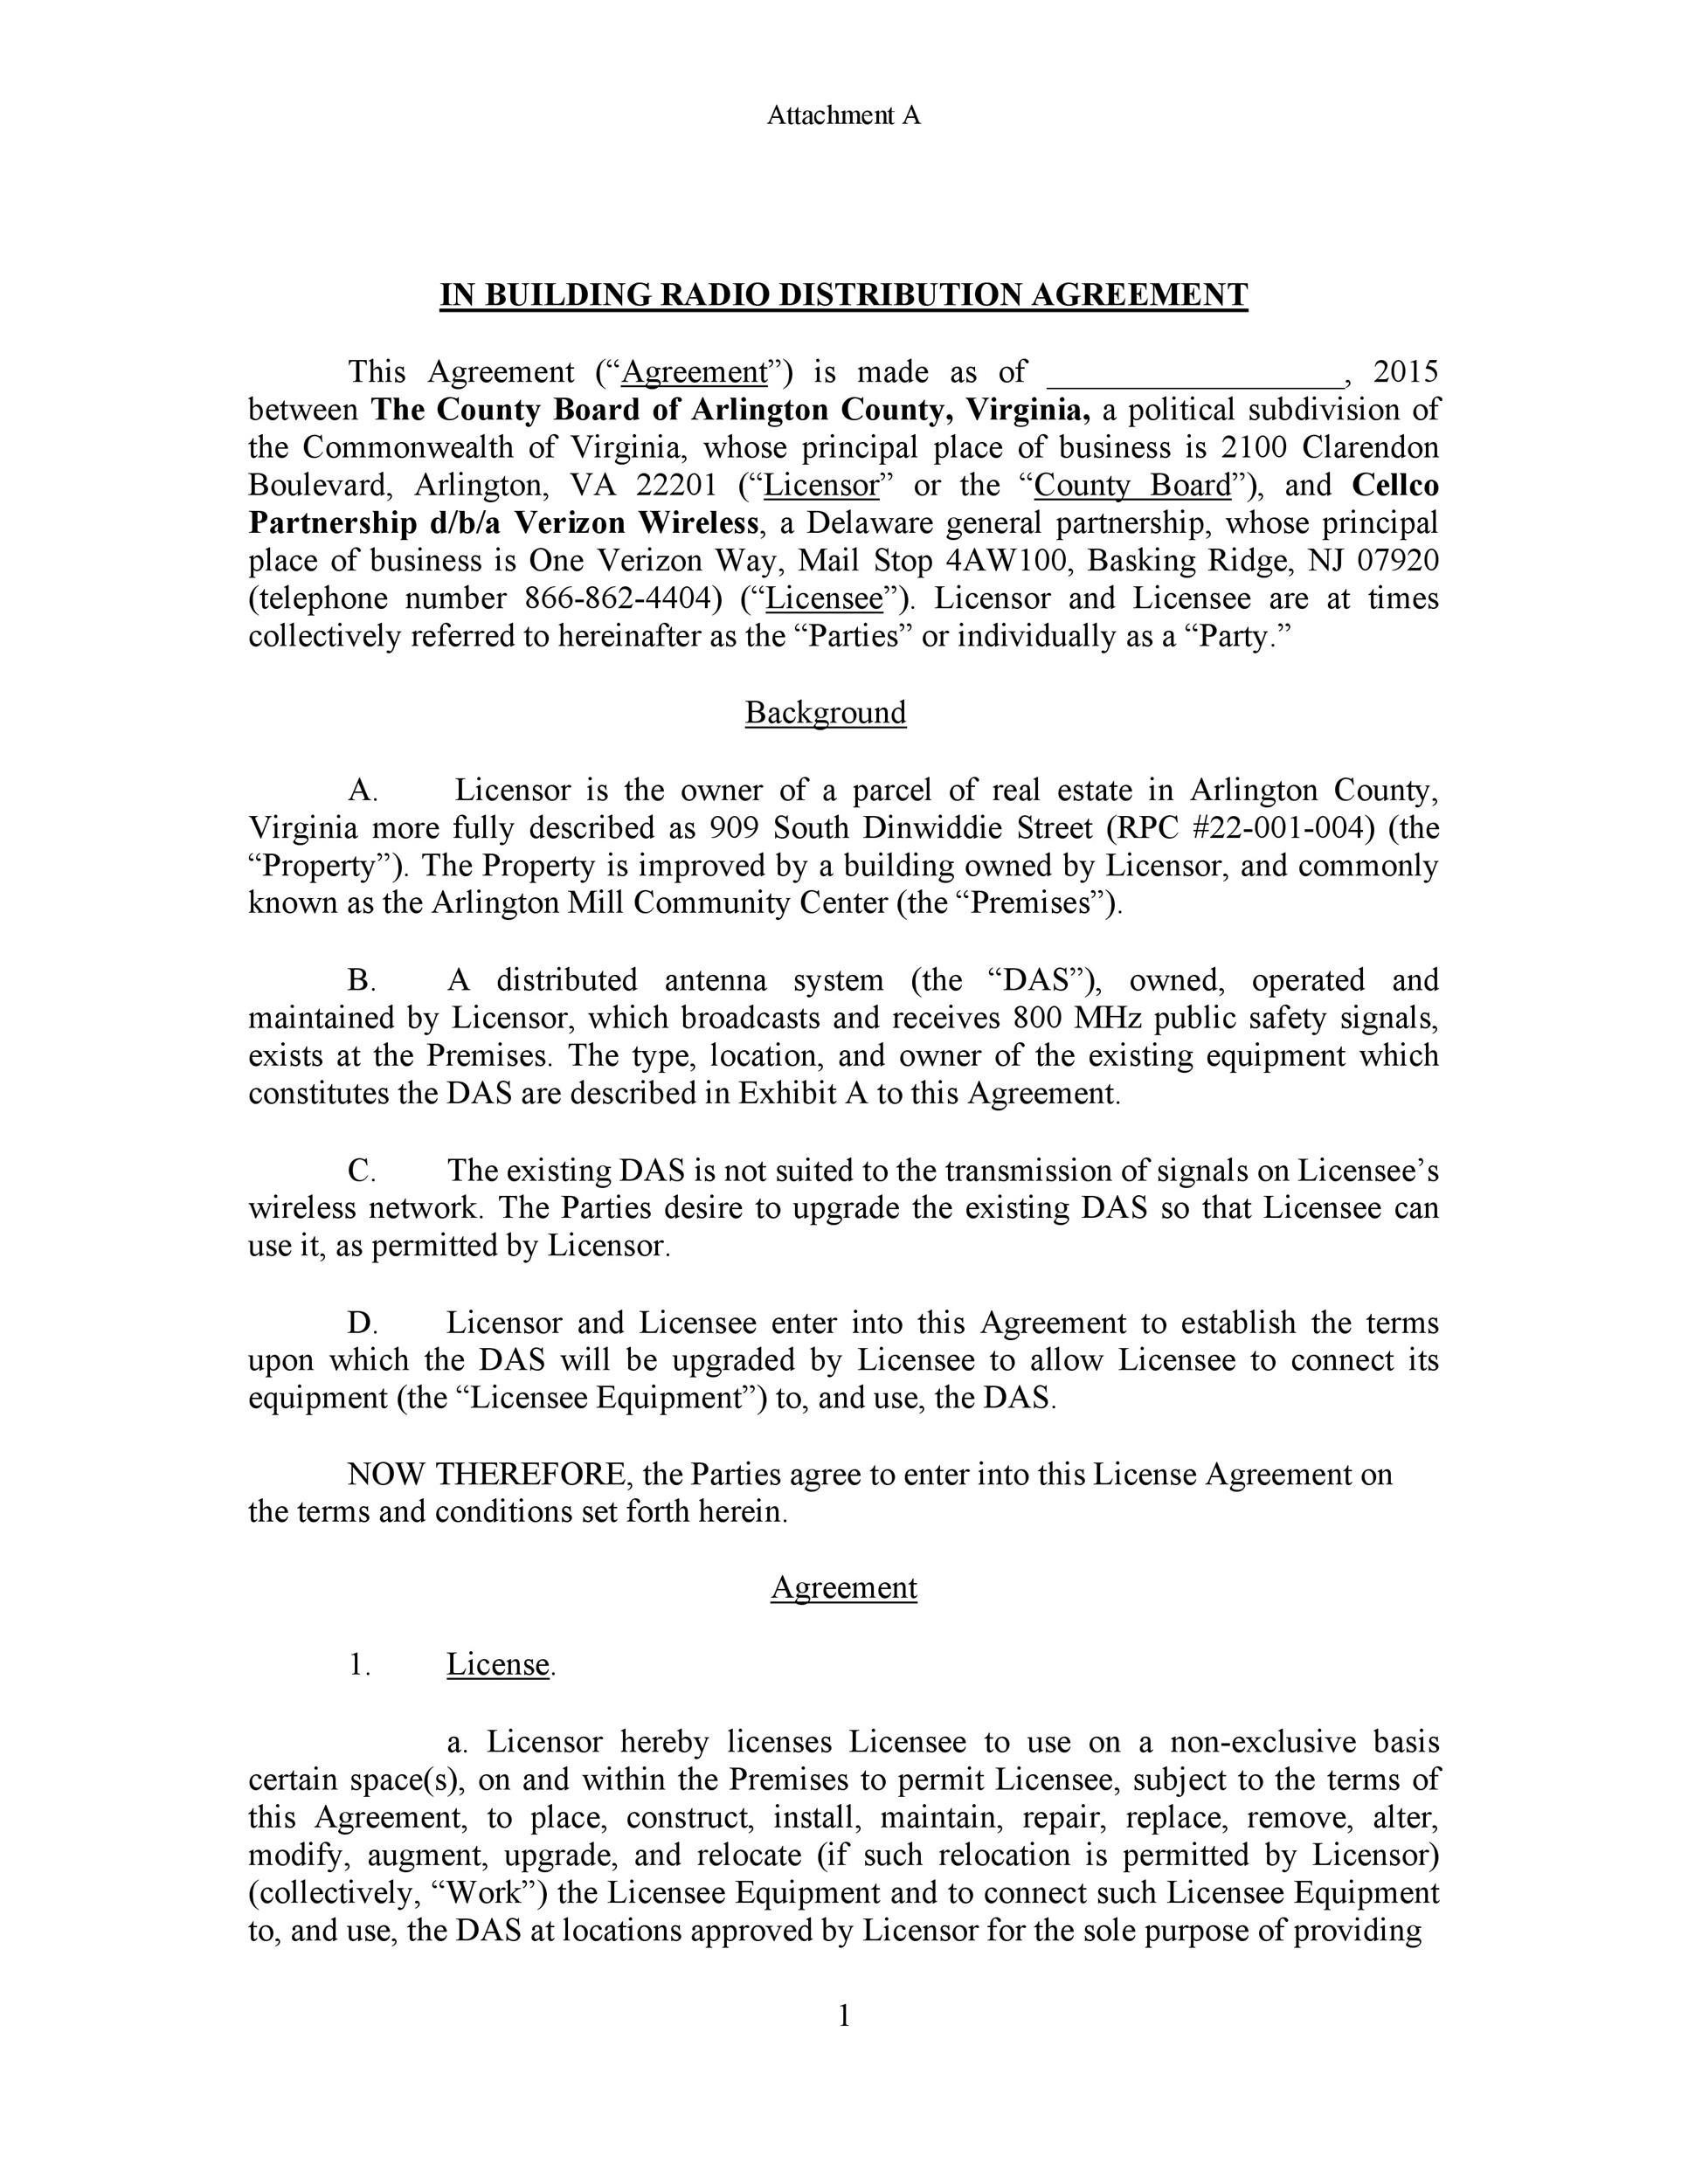 Free distribution agreement 50